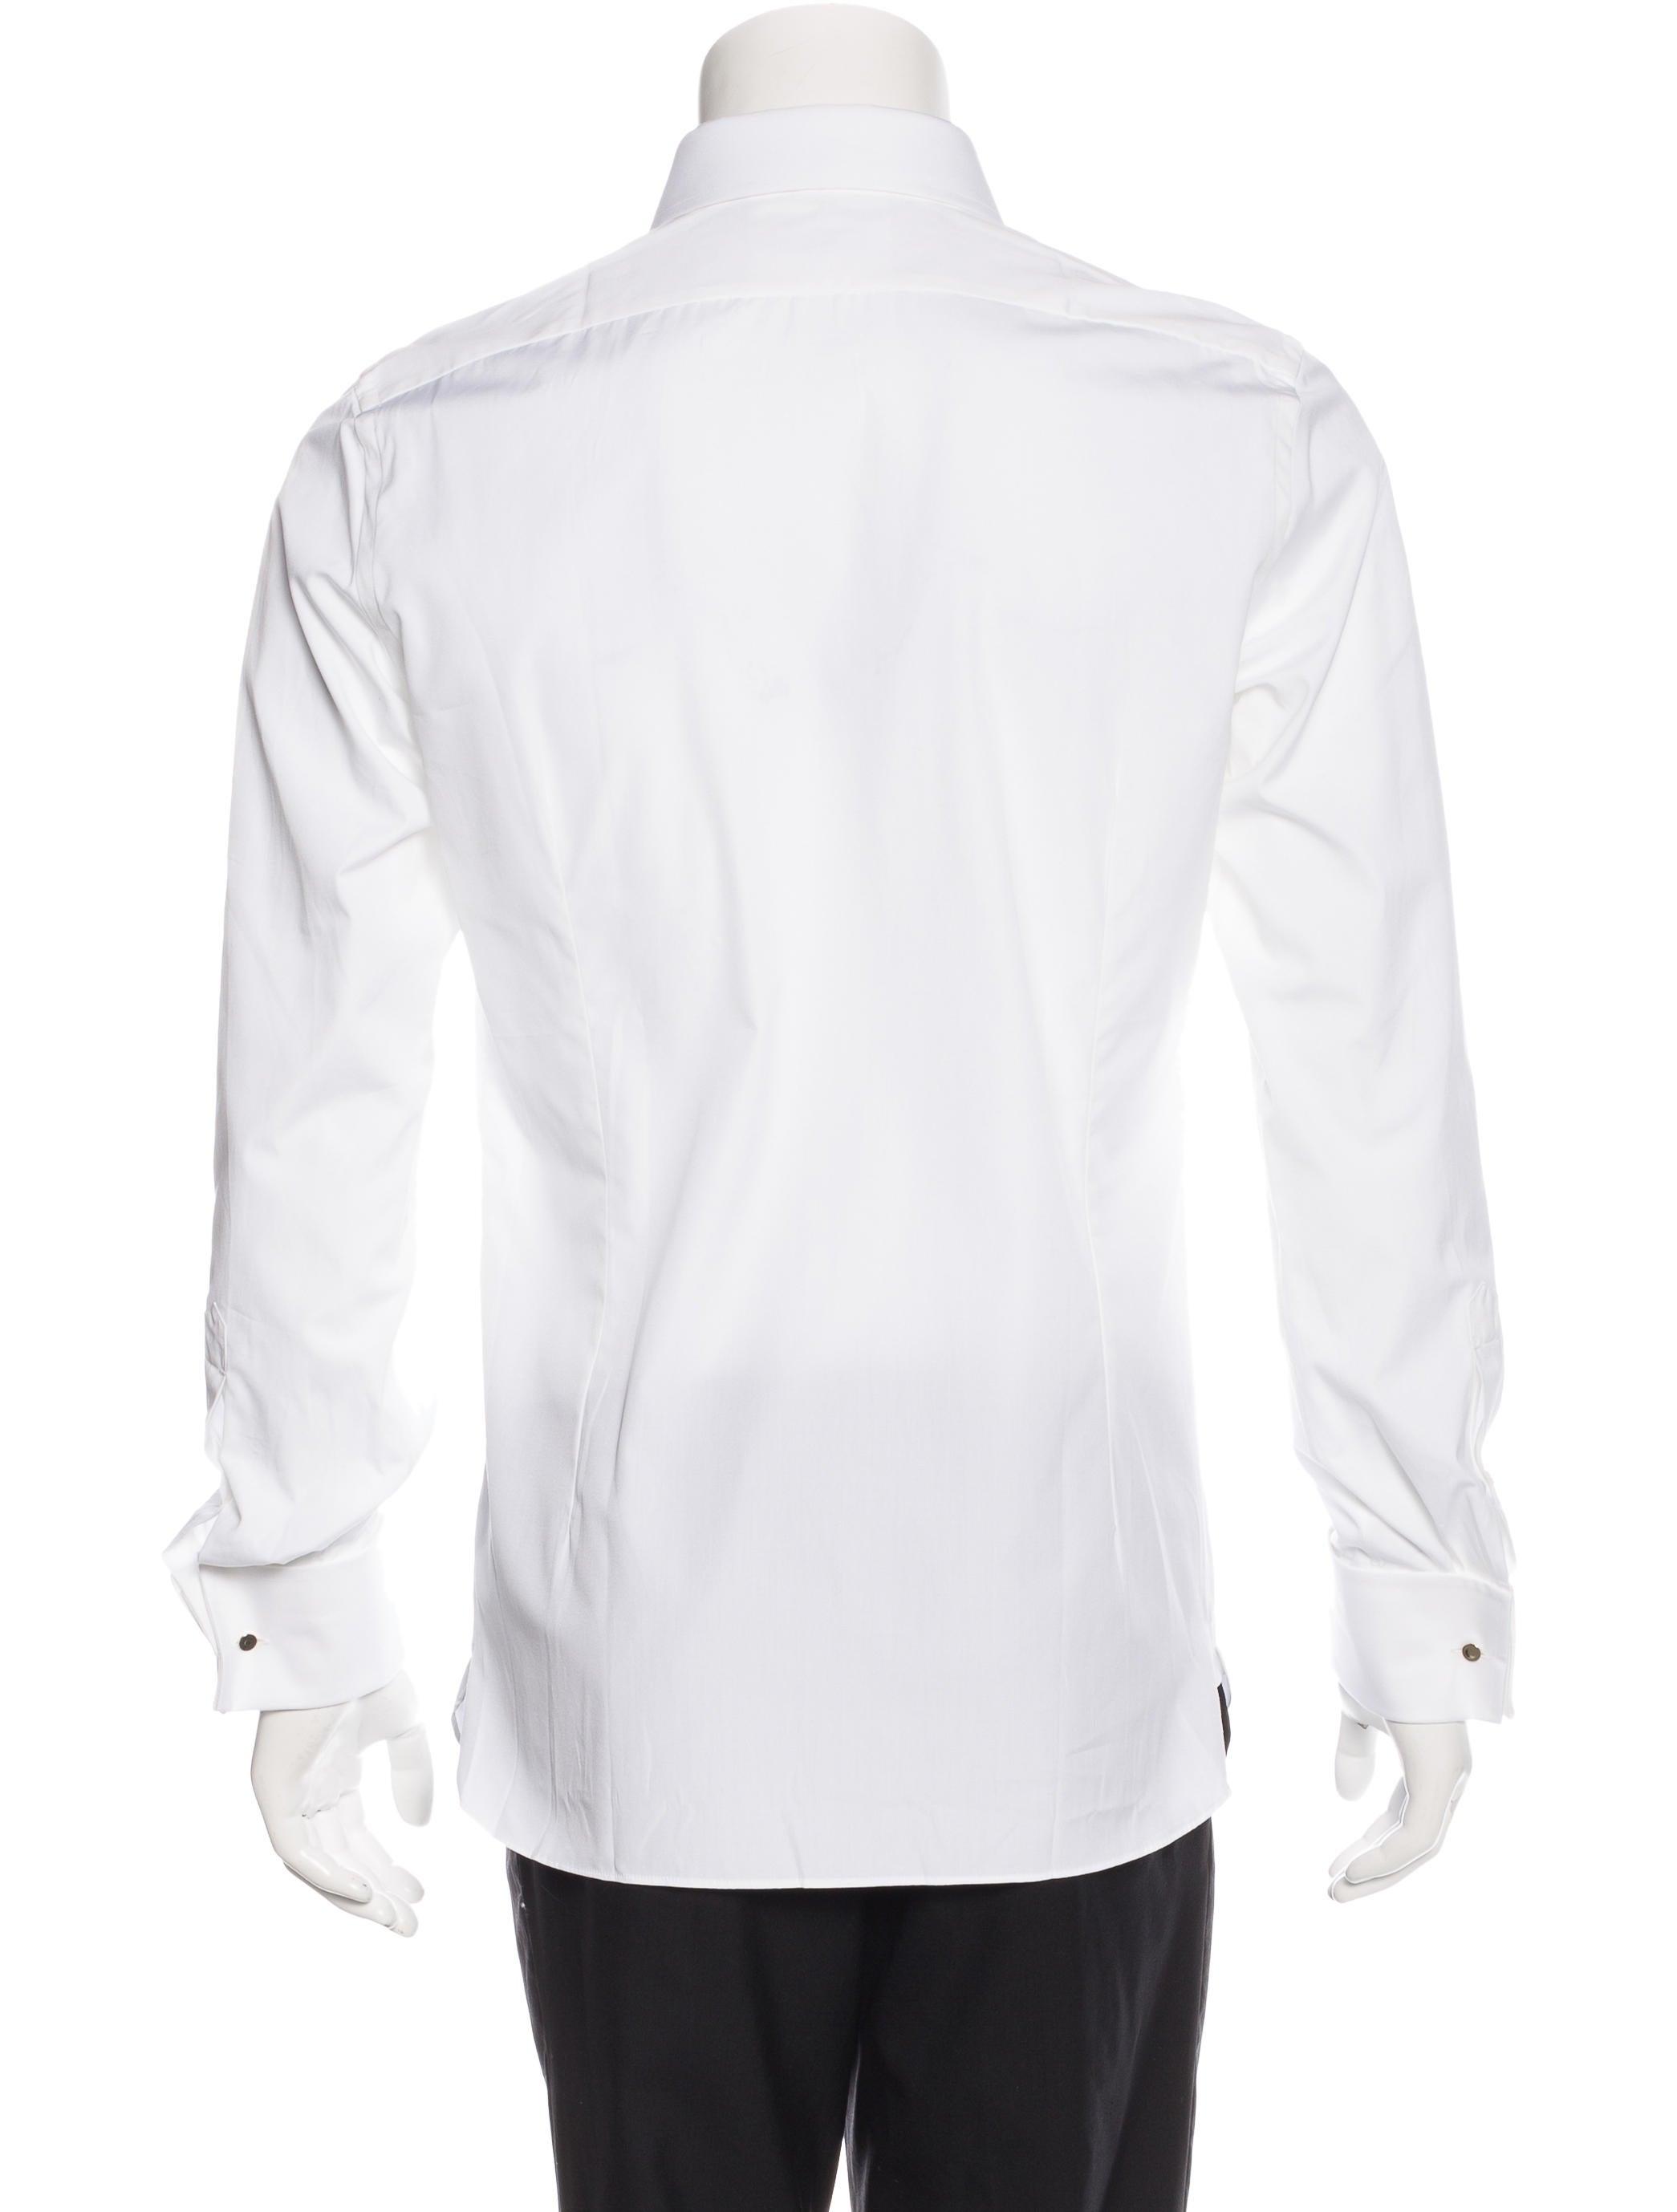 Tom ford french cuff dress shirt clothing tom32336 for Dress shirt french cuffs